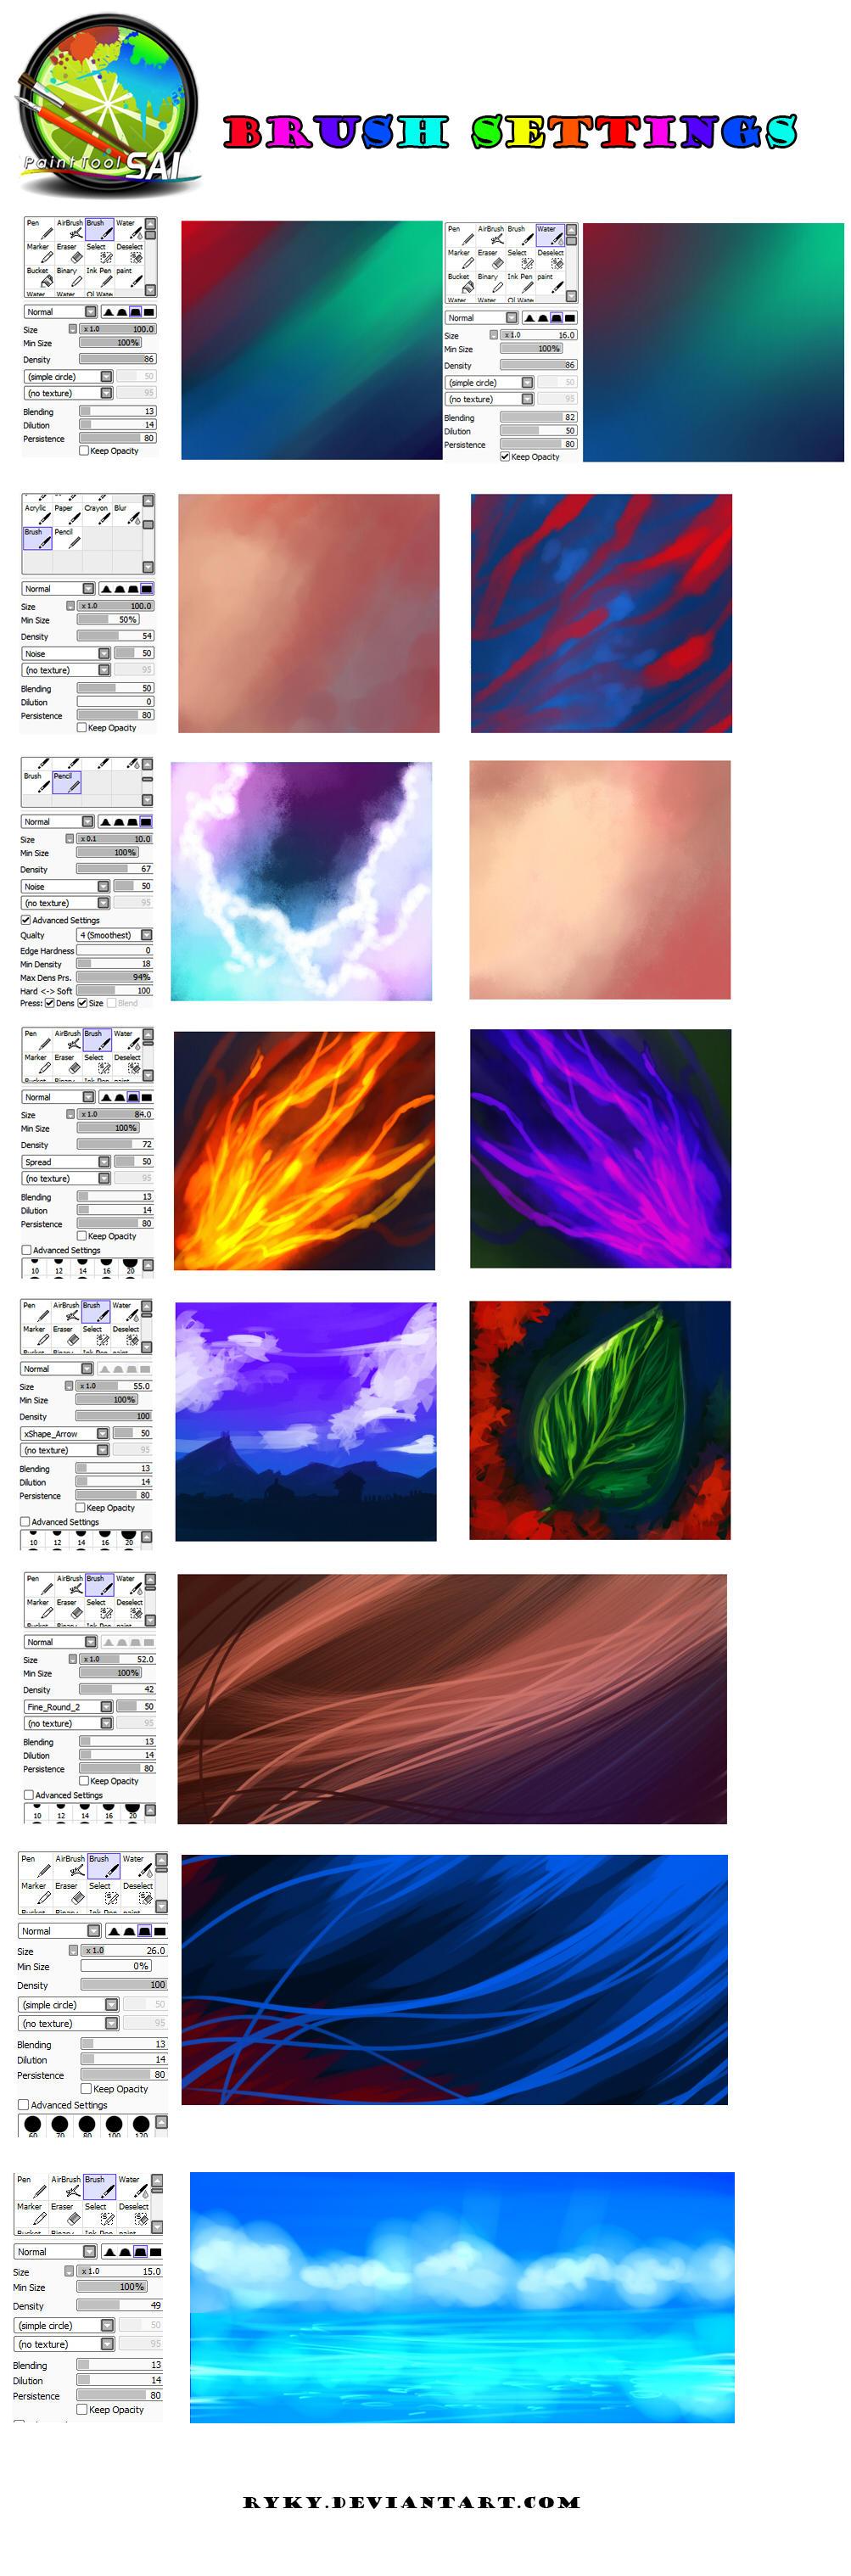 Paint tool SAI - BRUSH SETTINGS by ryky